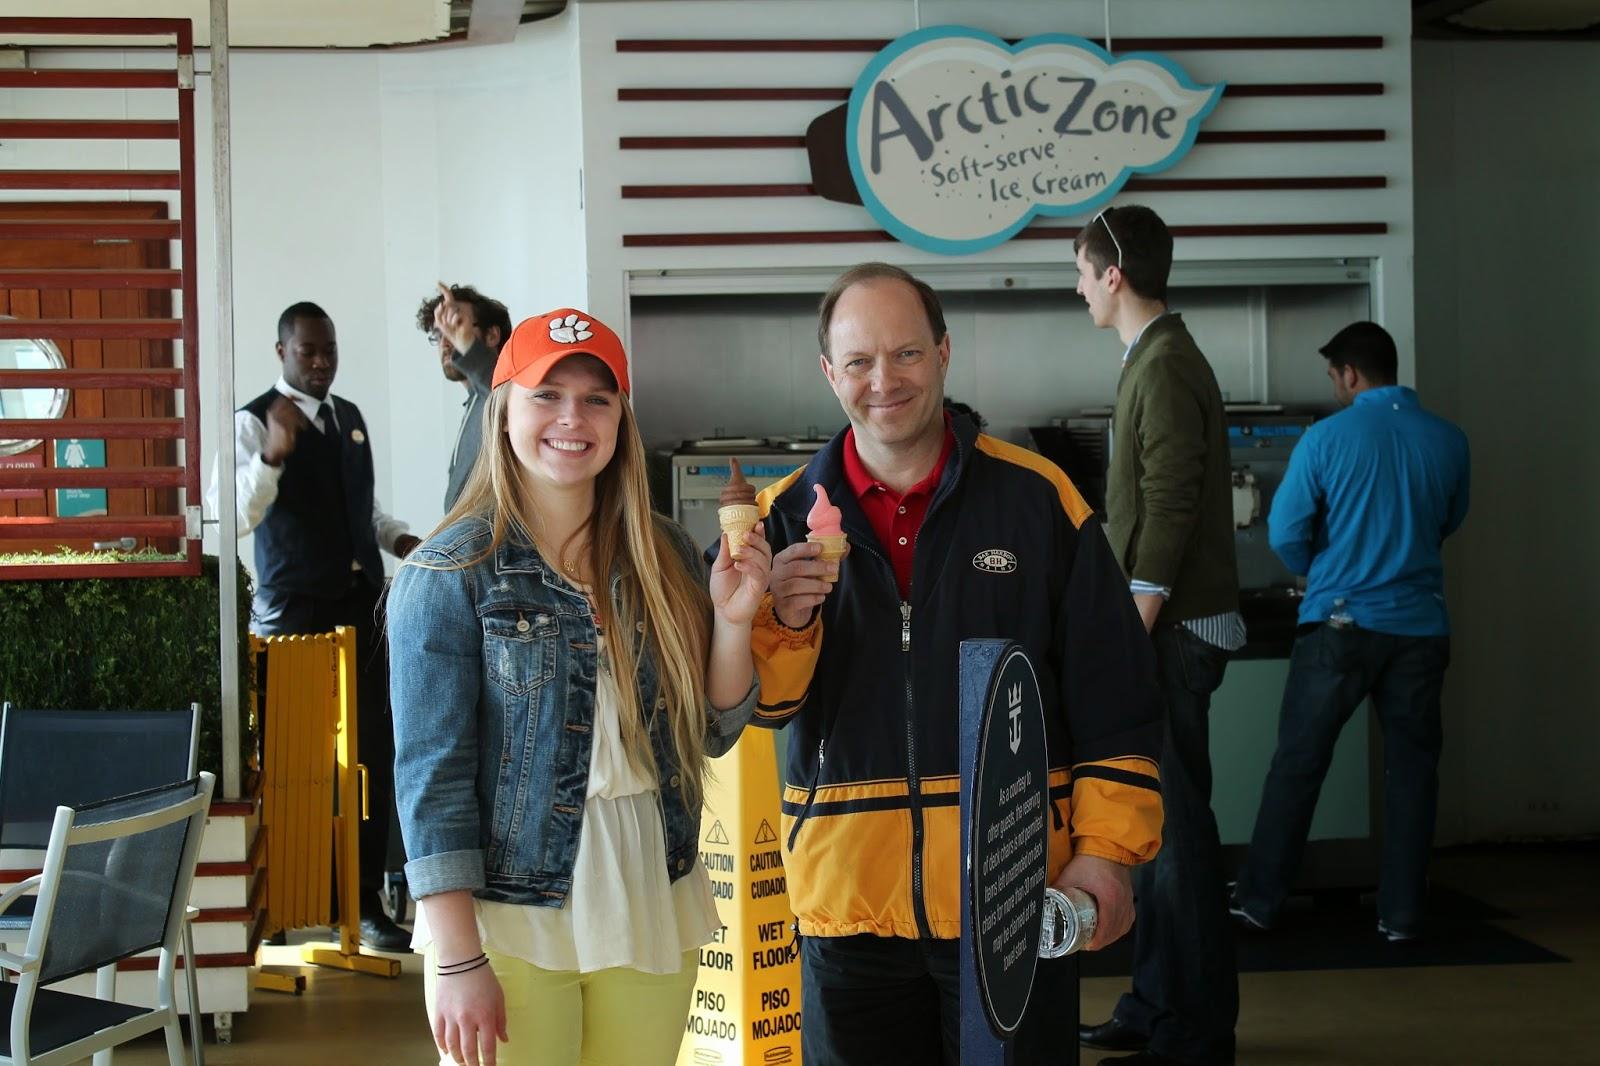 family holding ice cream cones on cruise ship, Royal Caribbean Arctic Zone